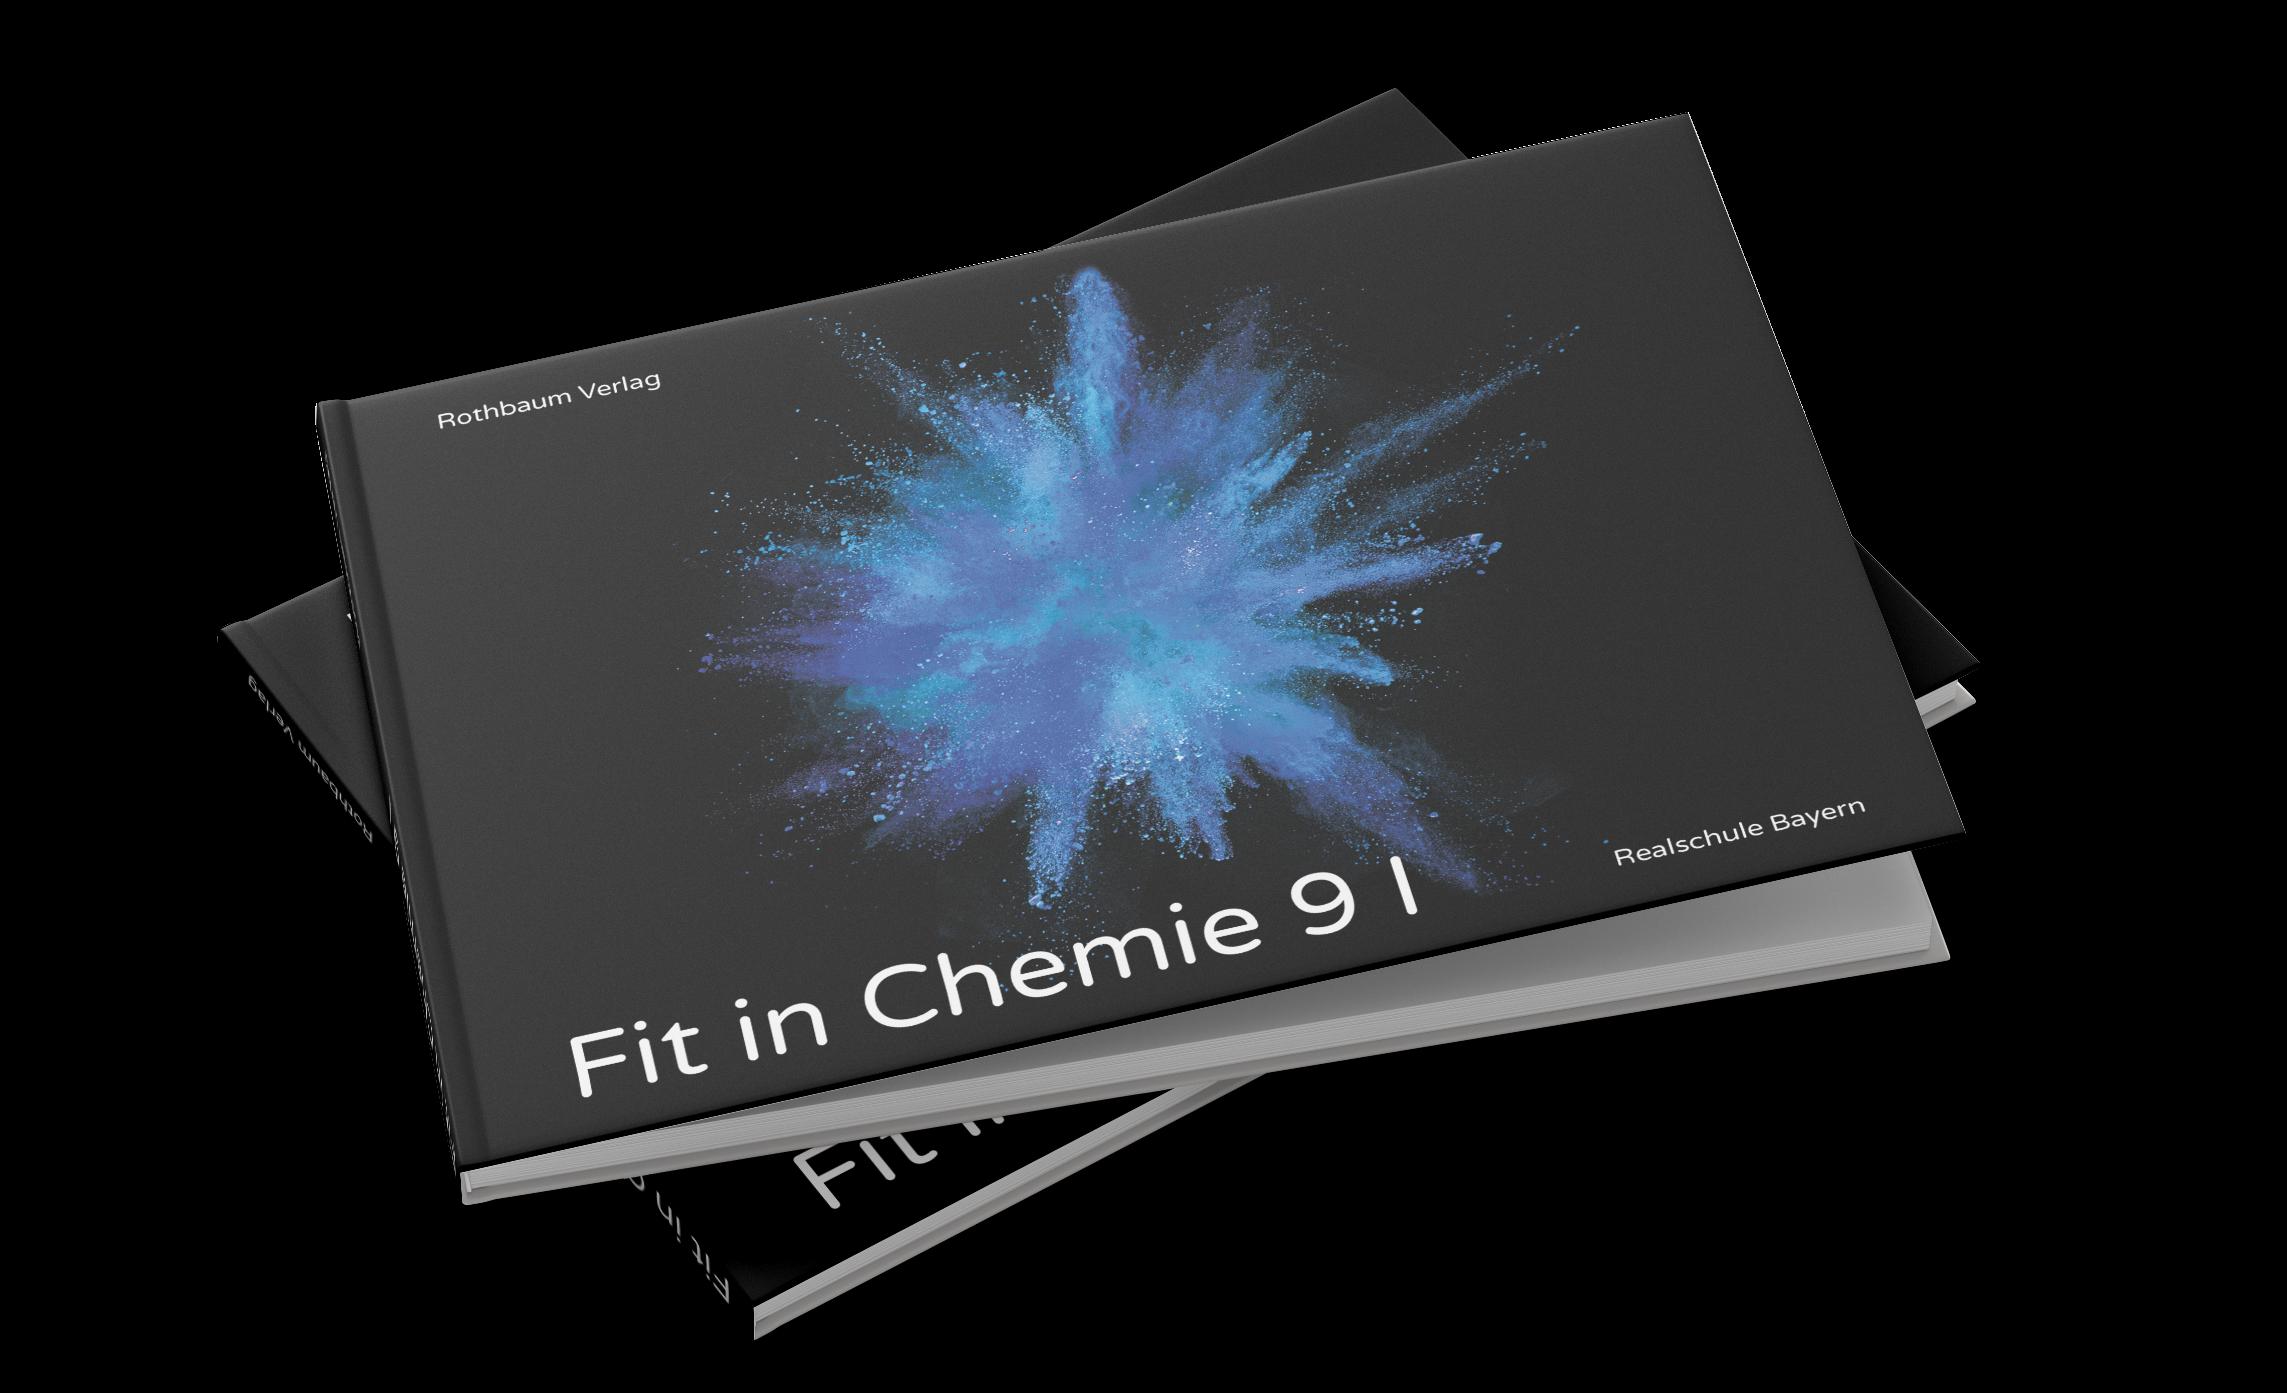 Fit in Chemie 9 I [gedrucktes Schulbuch]